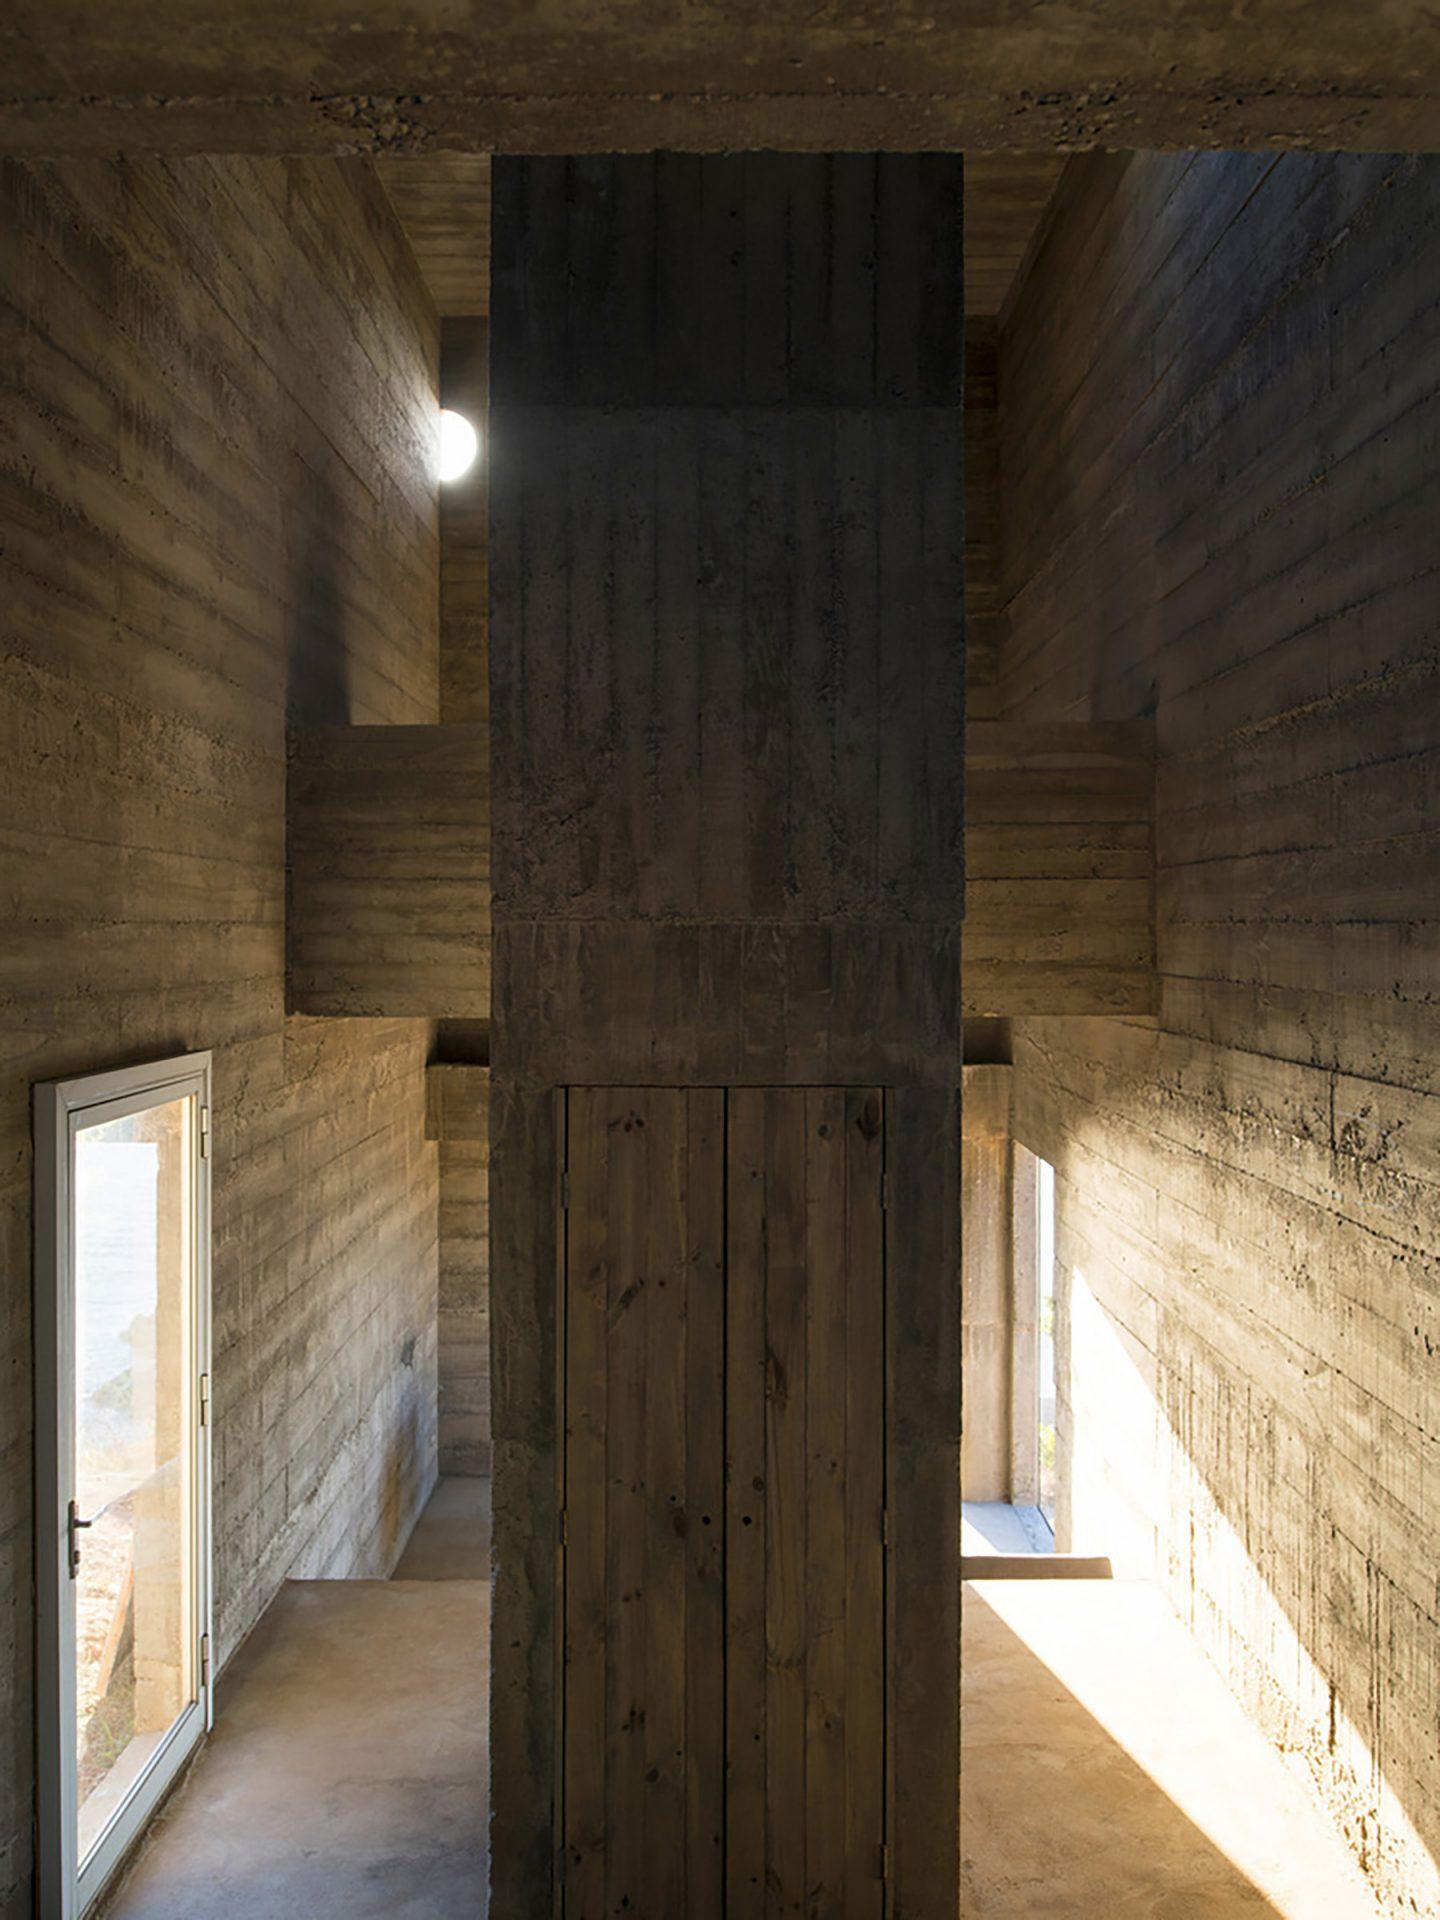 iGNANT-Architecture-Pezo-von-Ellrichshausen-Loba-House-008